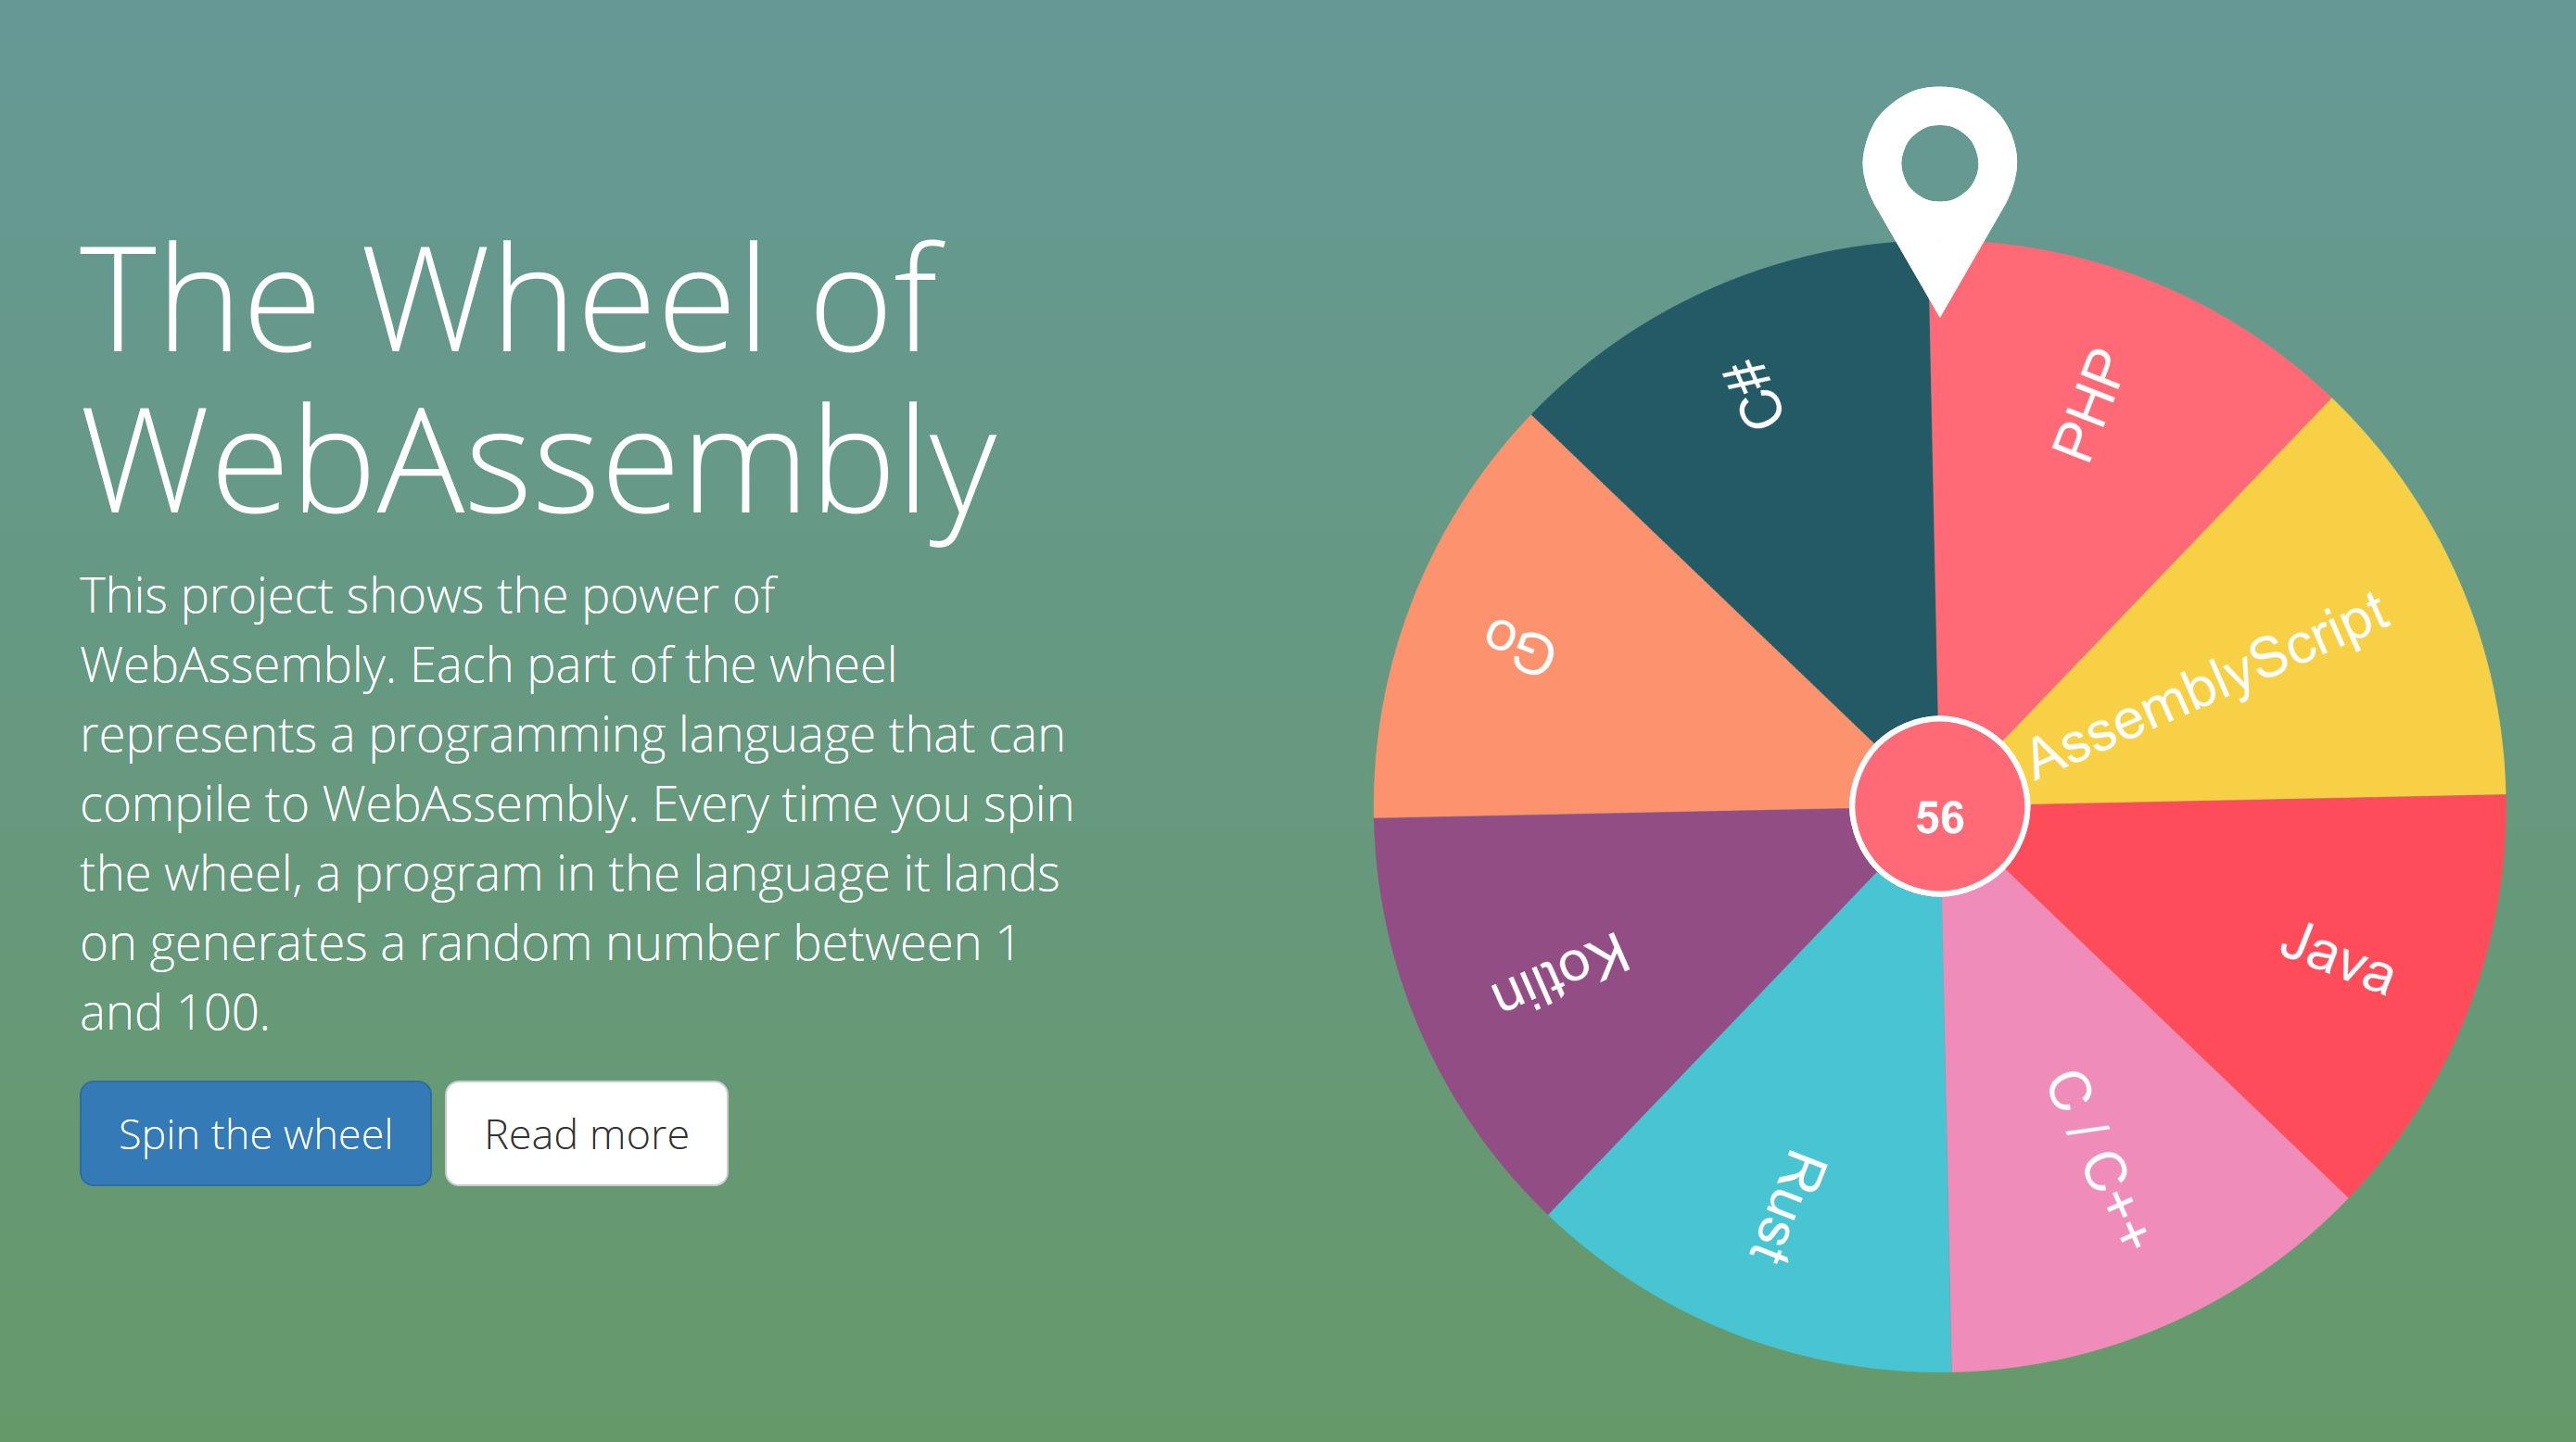 Wheel of WebAssembly logo